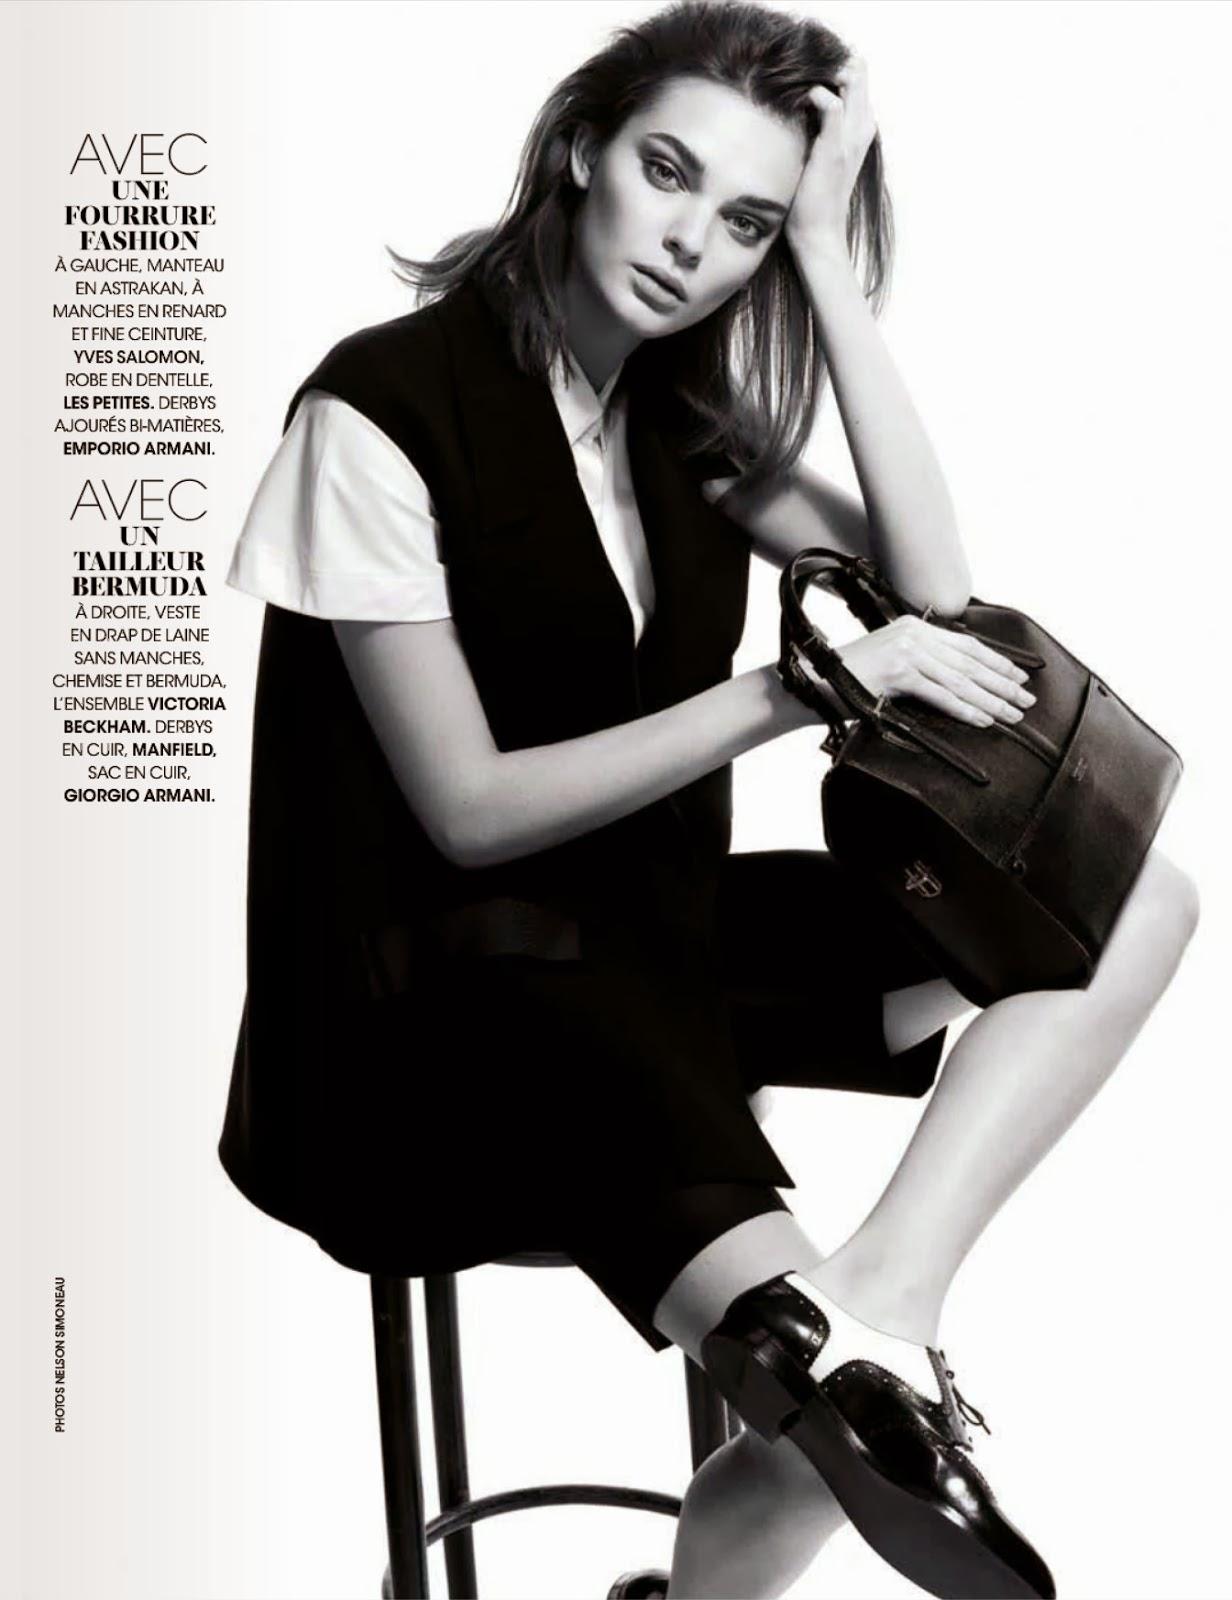 Kersti Pohlak Madame Figaro France Magazine Photoshoot Janvier 2014 HQ Pics